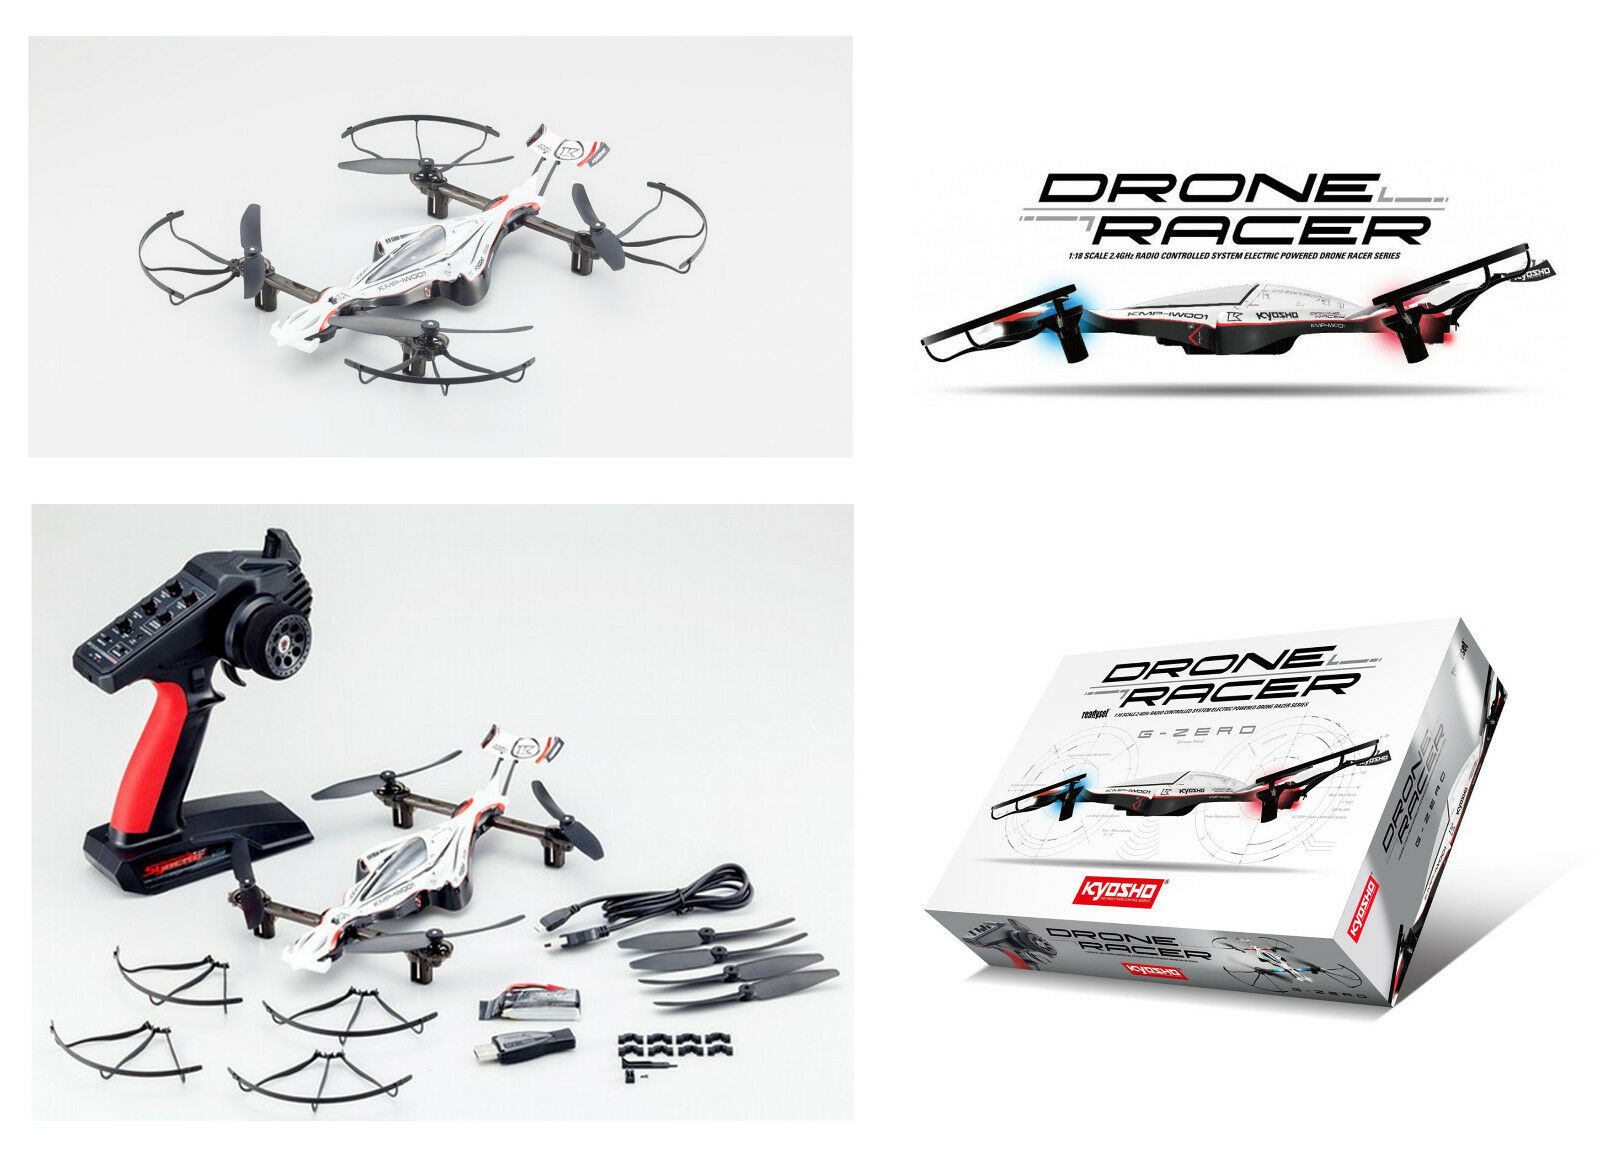 Kyosho Drone Racer  G-Zero Dynamic bianca Readyset  prezzo all'ingrosso e qualità affidabile